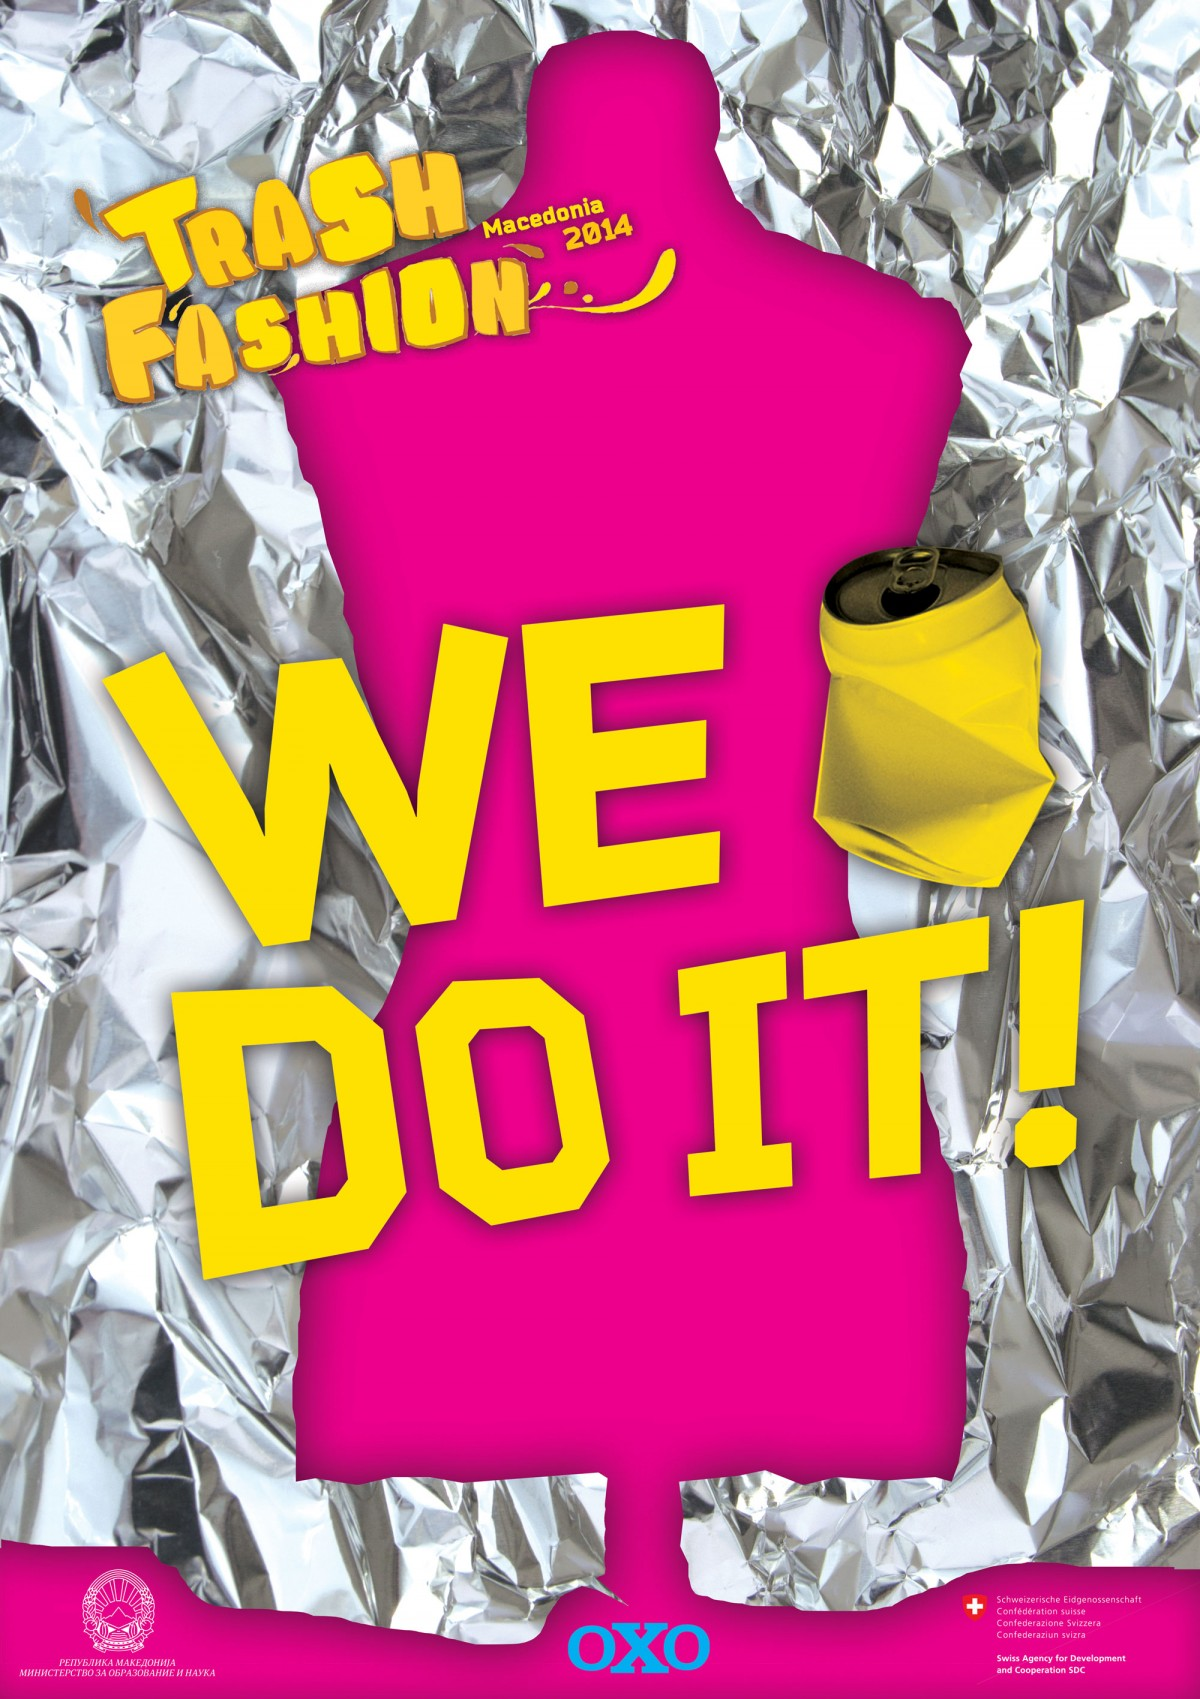 Trash Fashion Macedonia 2014 poster